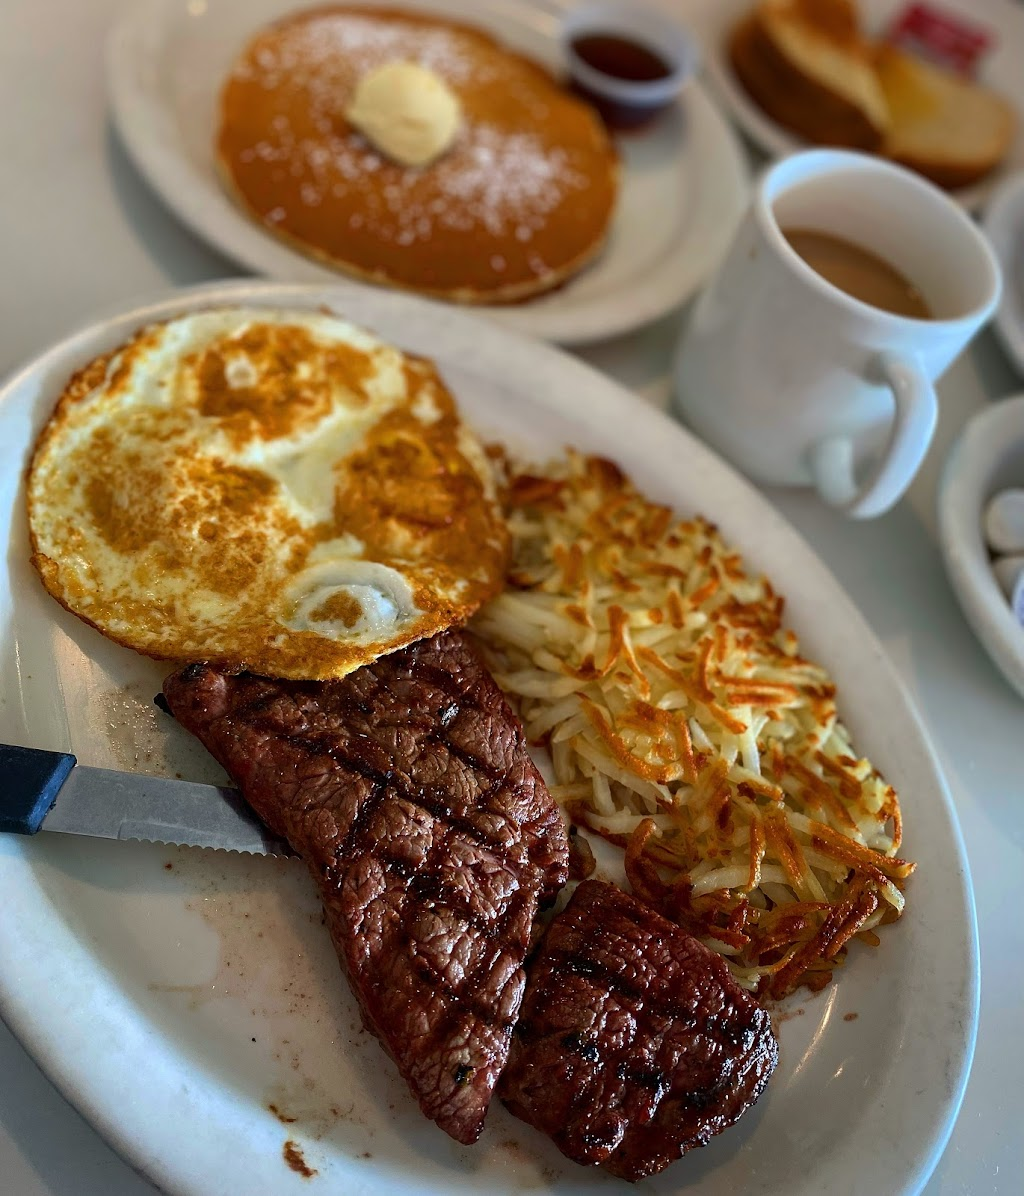 Ozzies Diner - restaurant  | Photo 8 of 10 | Address: 7780 E, Slauson Ave, Commerce, CA 90040, USA | Phone: (323) 477-1933